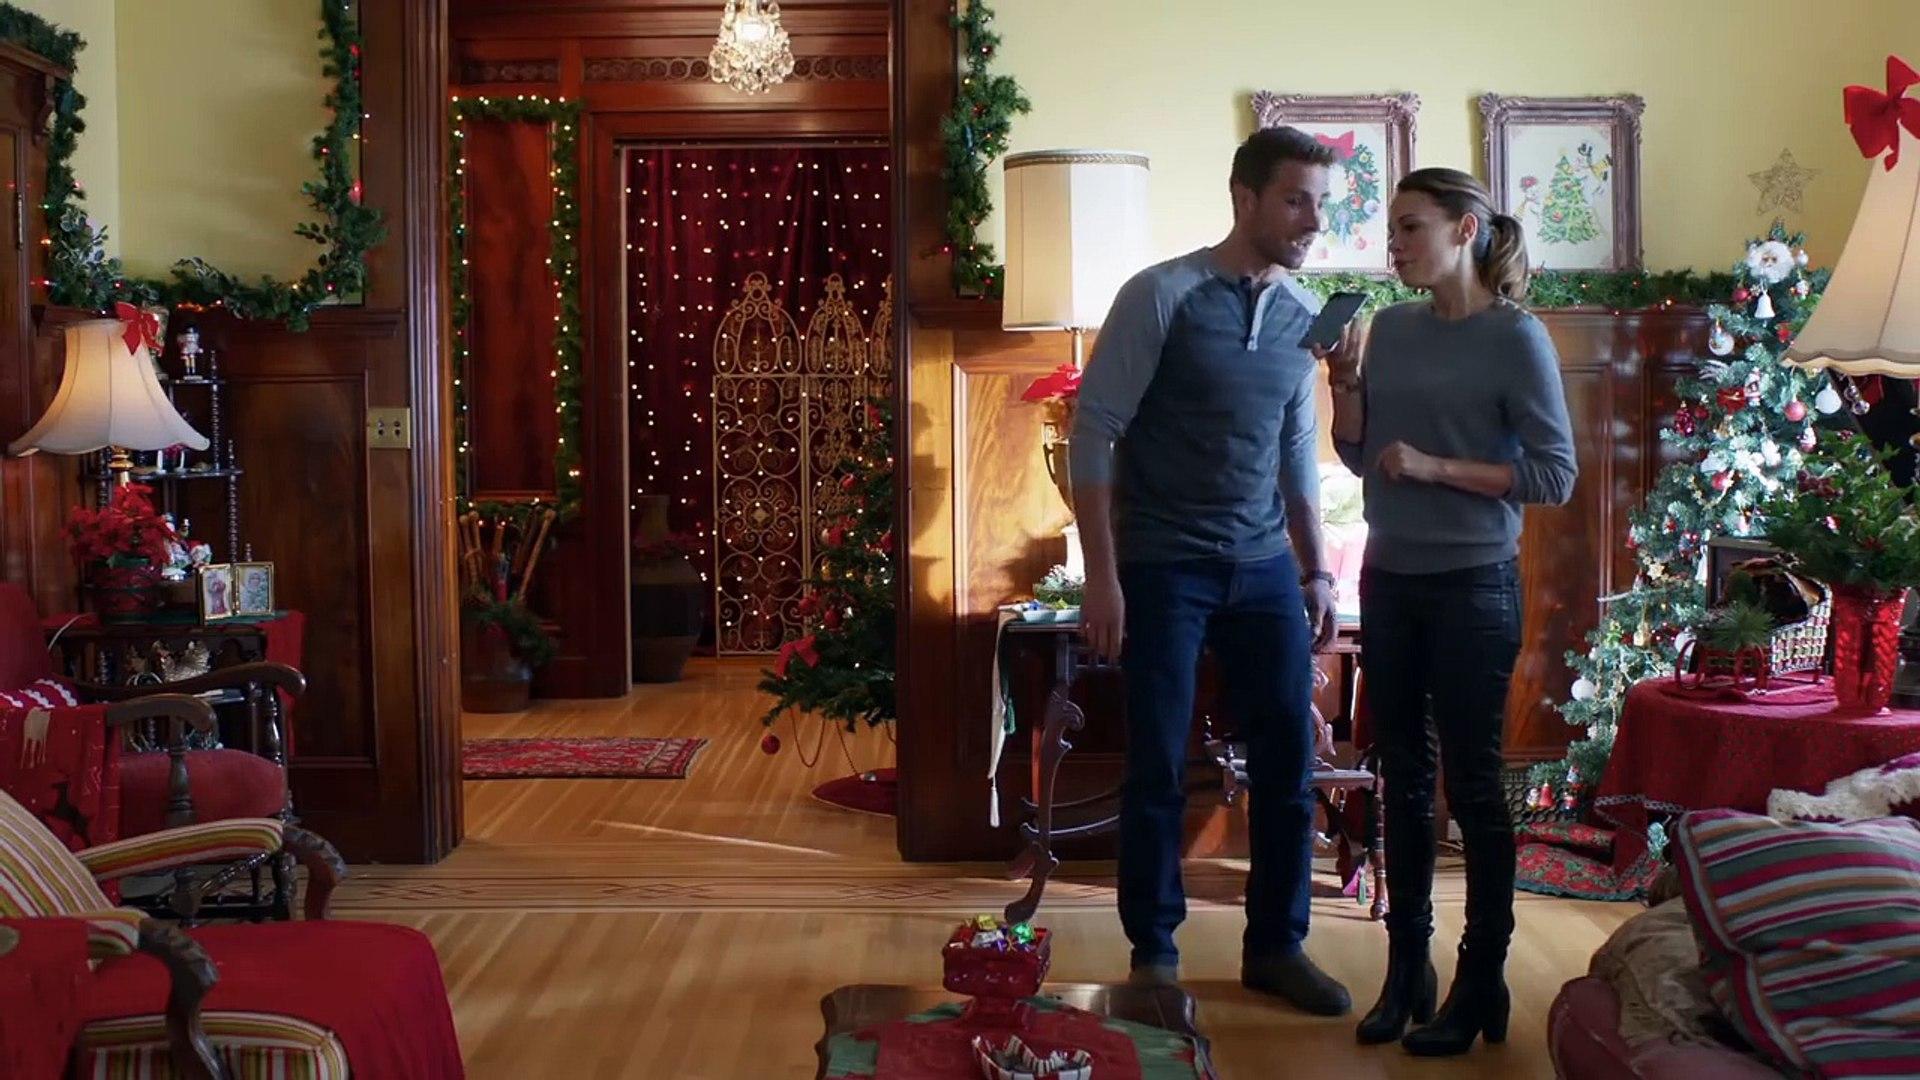 Snowed Inn Christmas.Snowed Inn Christmas Official Trailer Premieres Saturday December 16 At 8 7c Lifetime